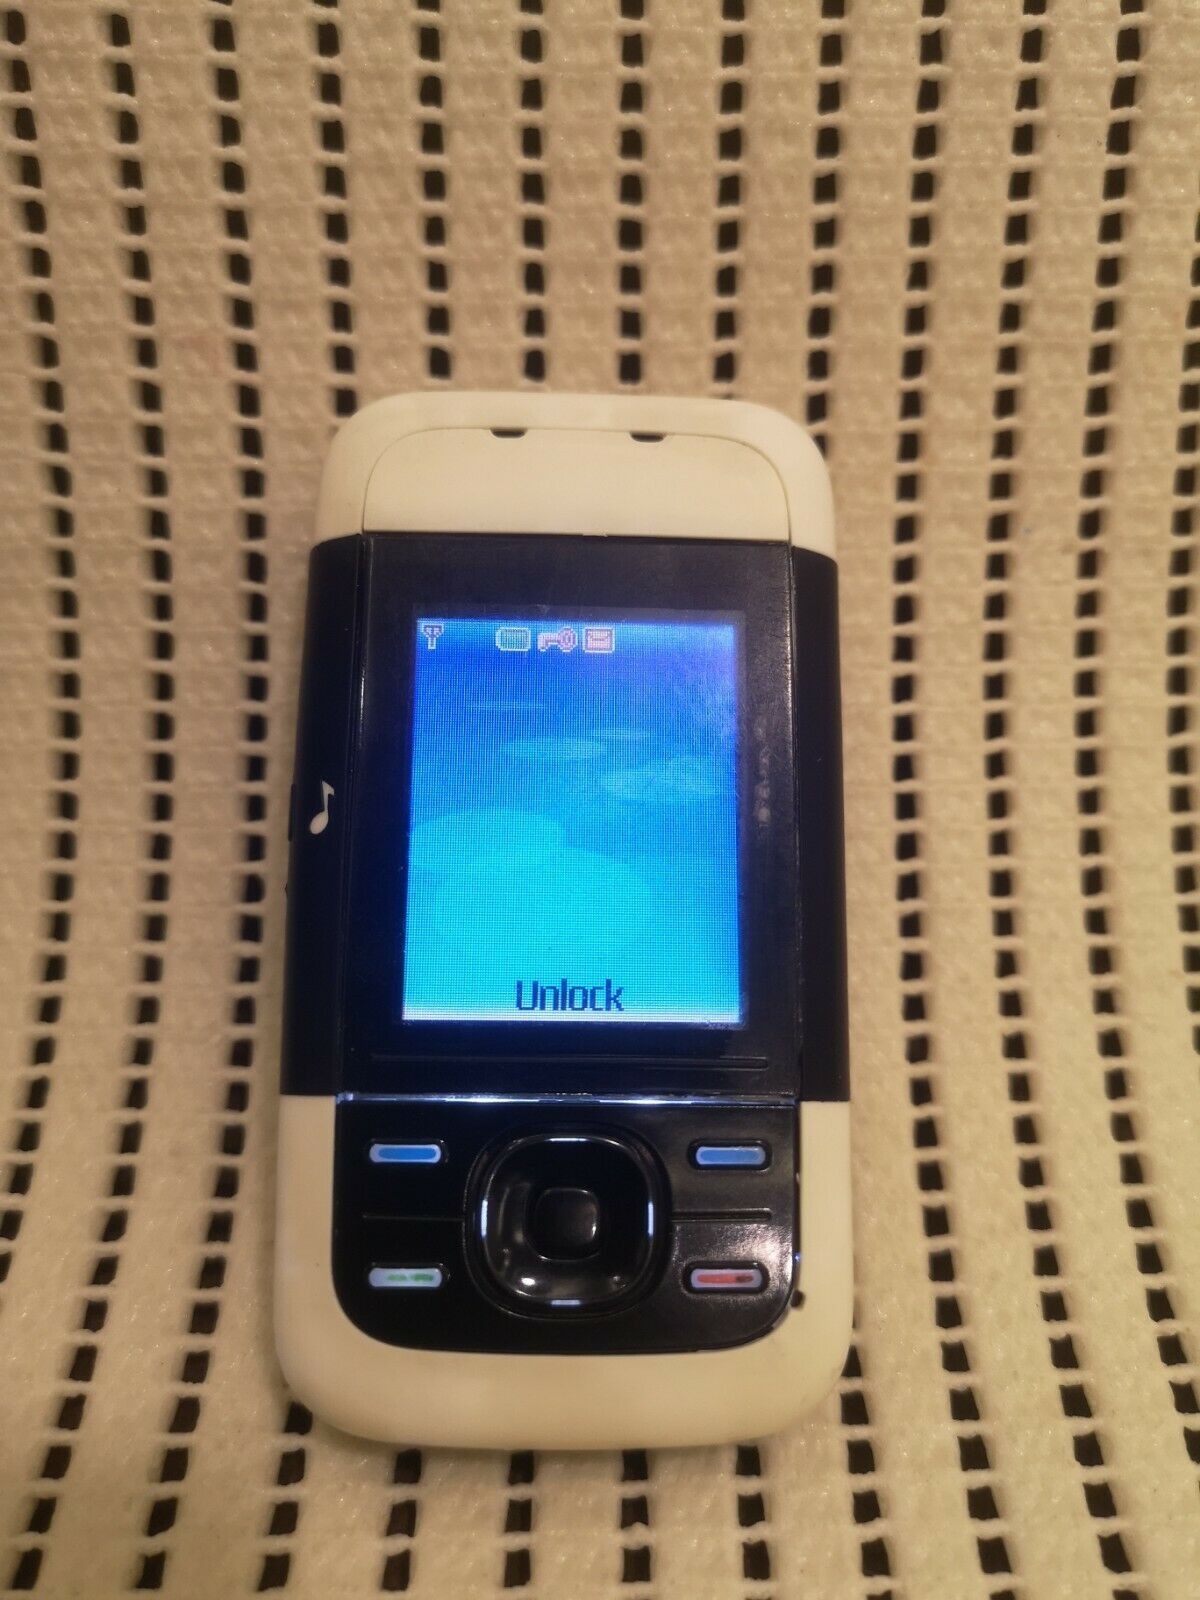 Nokia 5200 Black Unlocked Cellular Phone Old Nokia 5200 Vintage Rare 6417182757891 For Sale Online